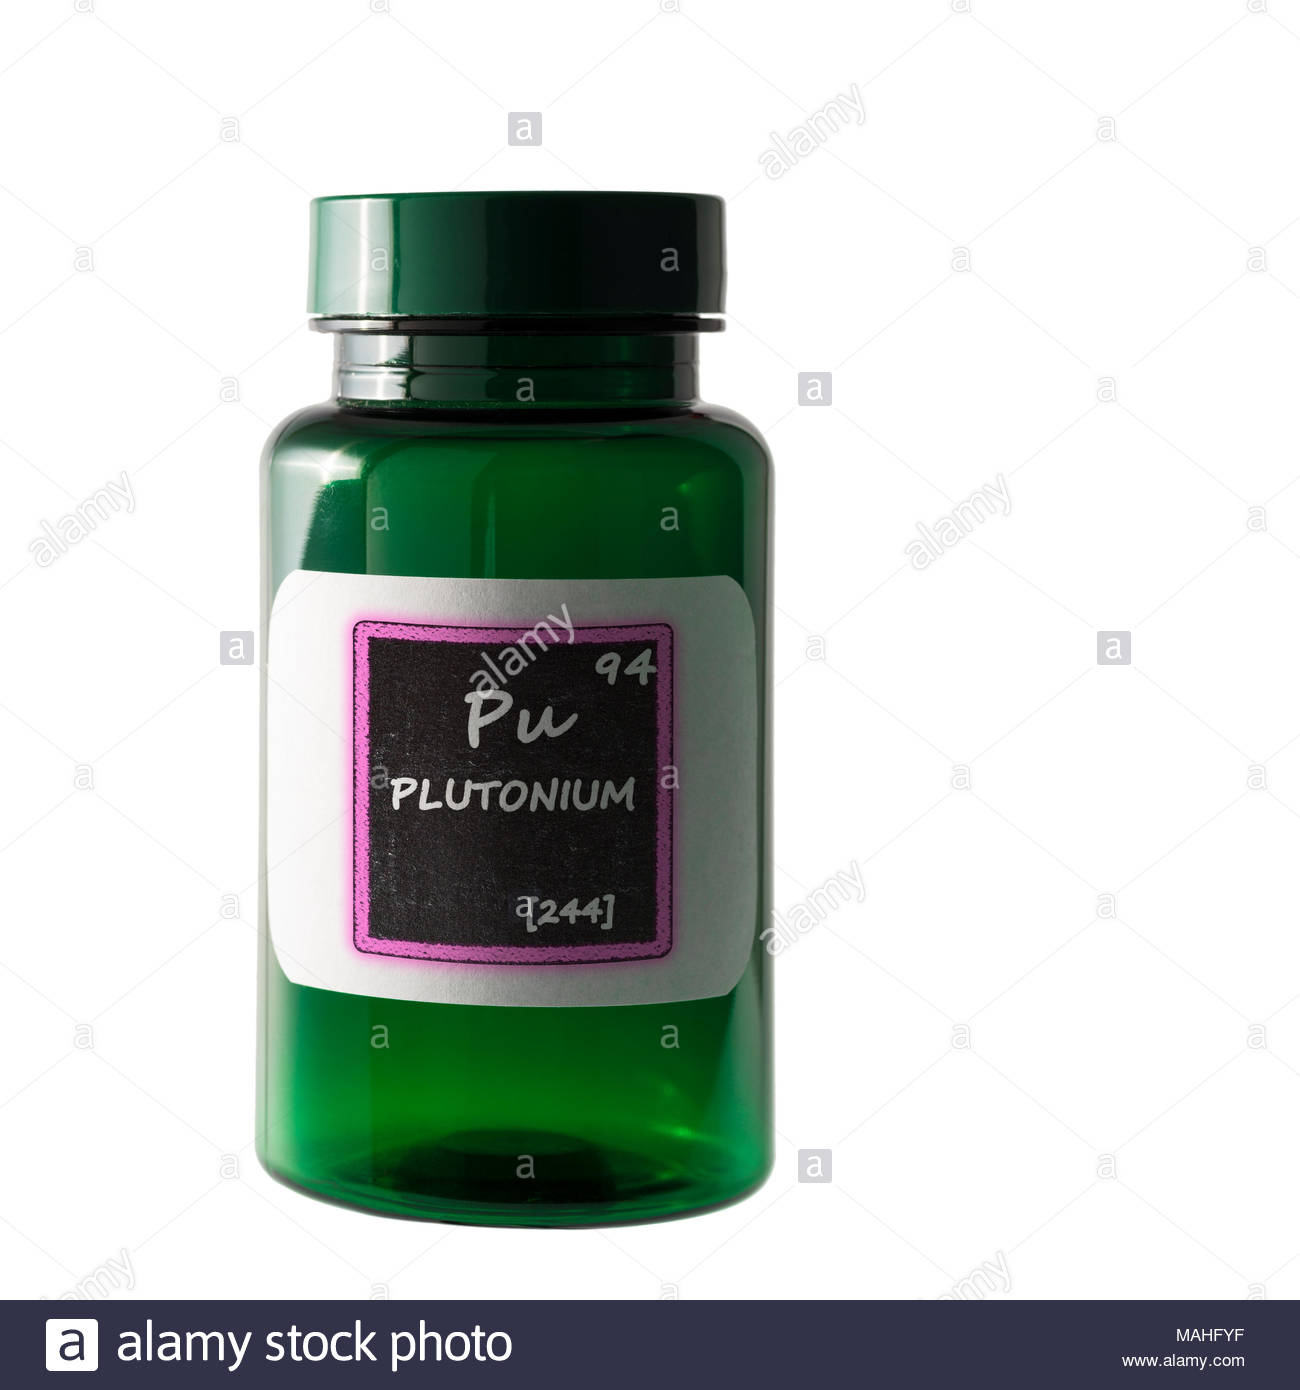 Plutonium Periodic Table Details Shown On Bottle Label Stock Photo